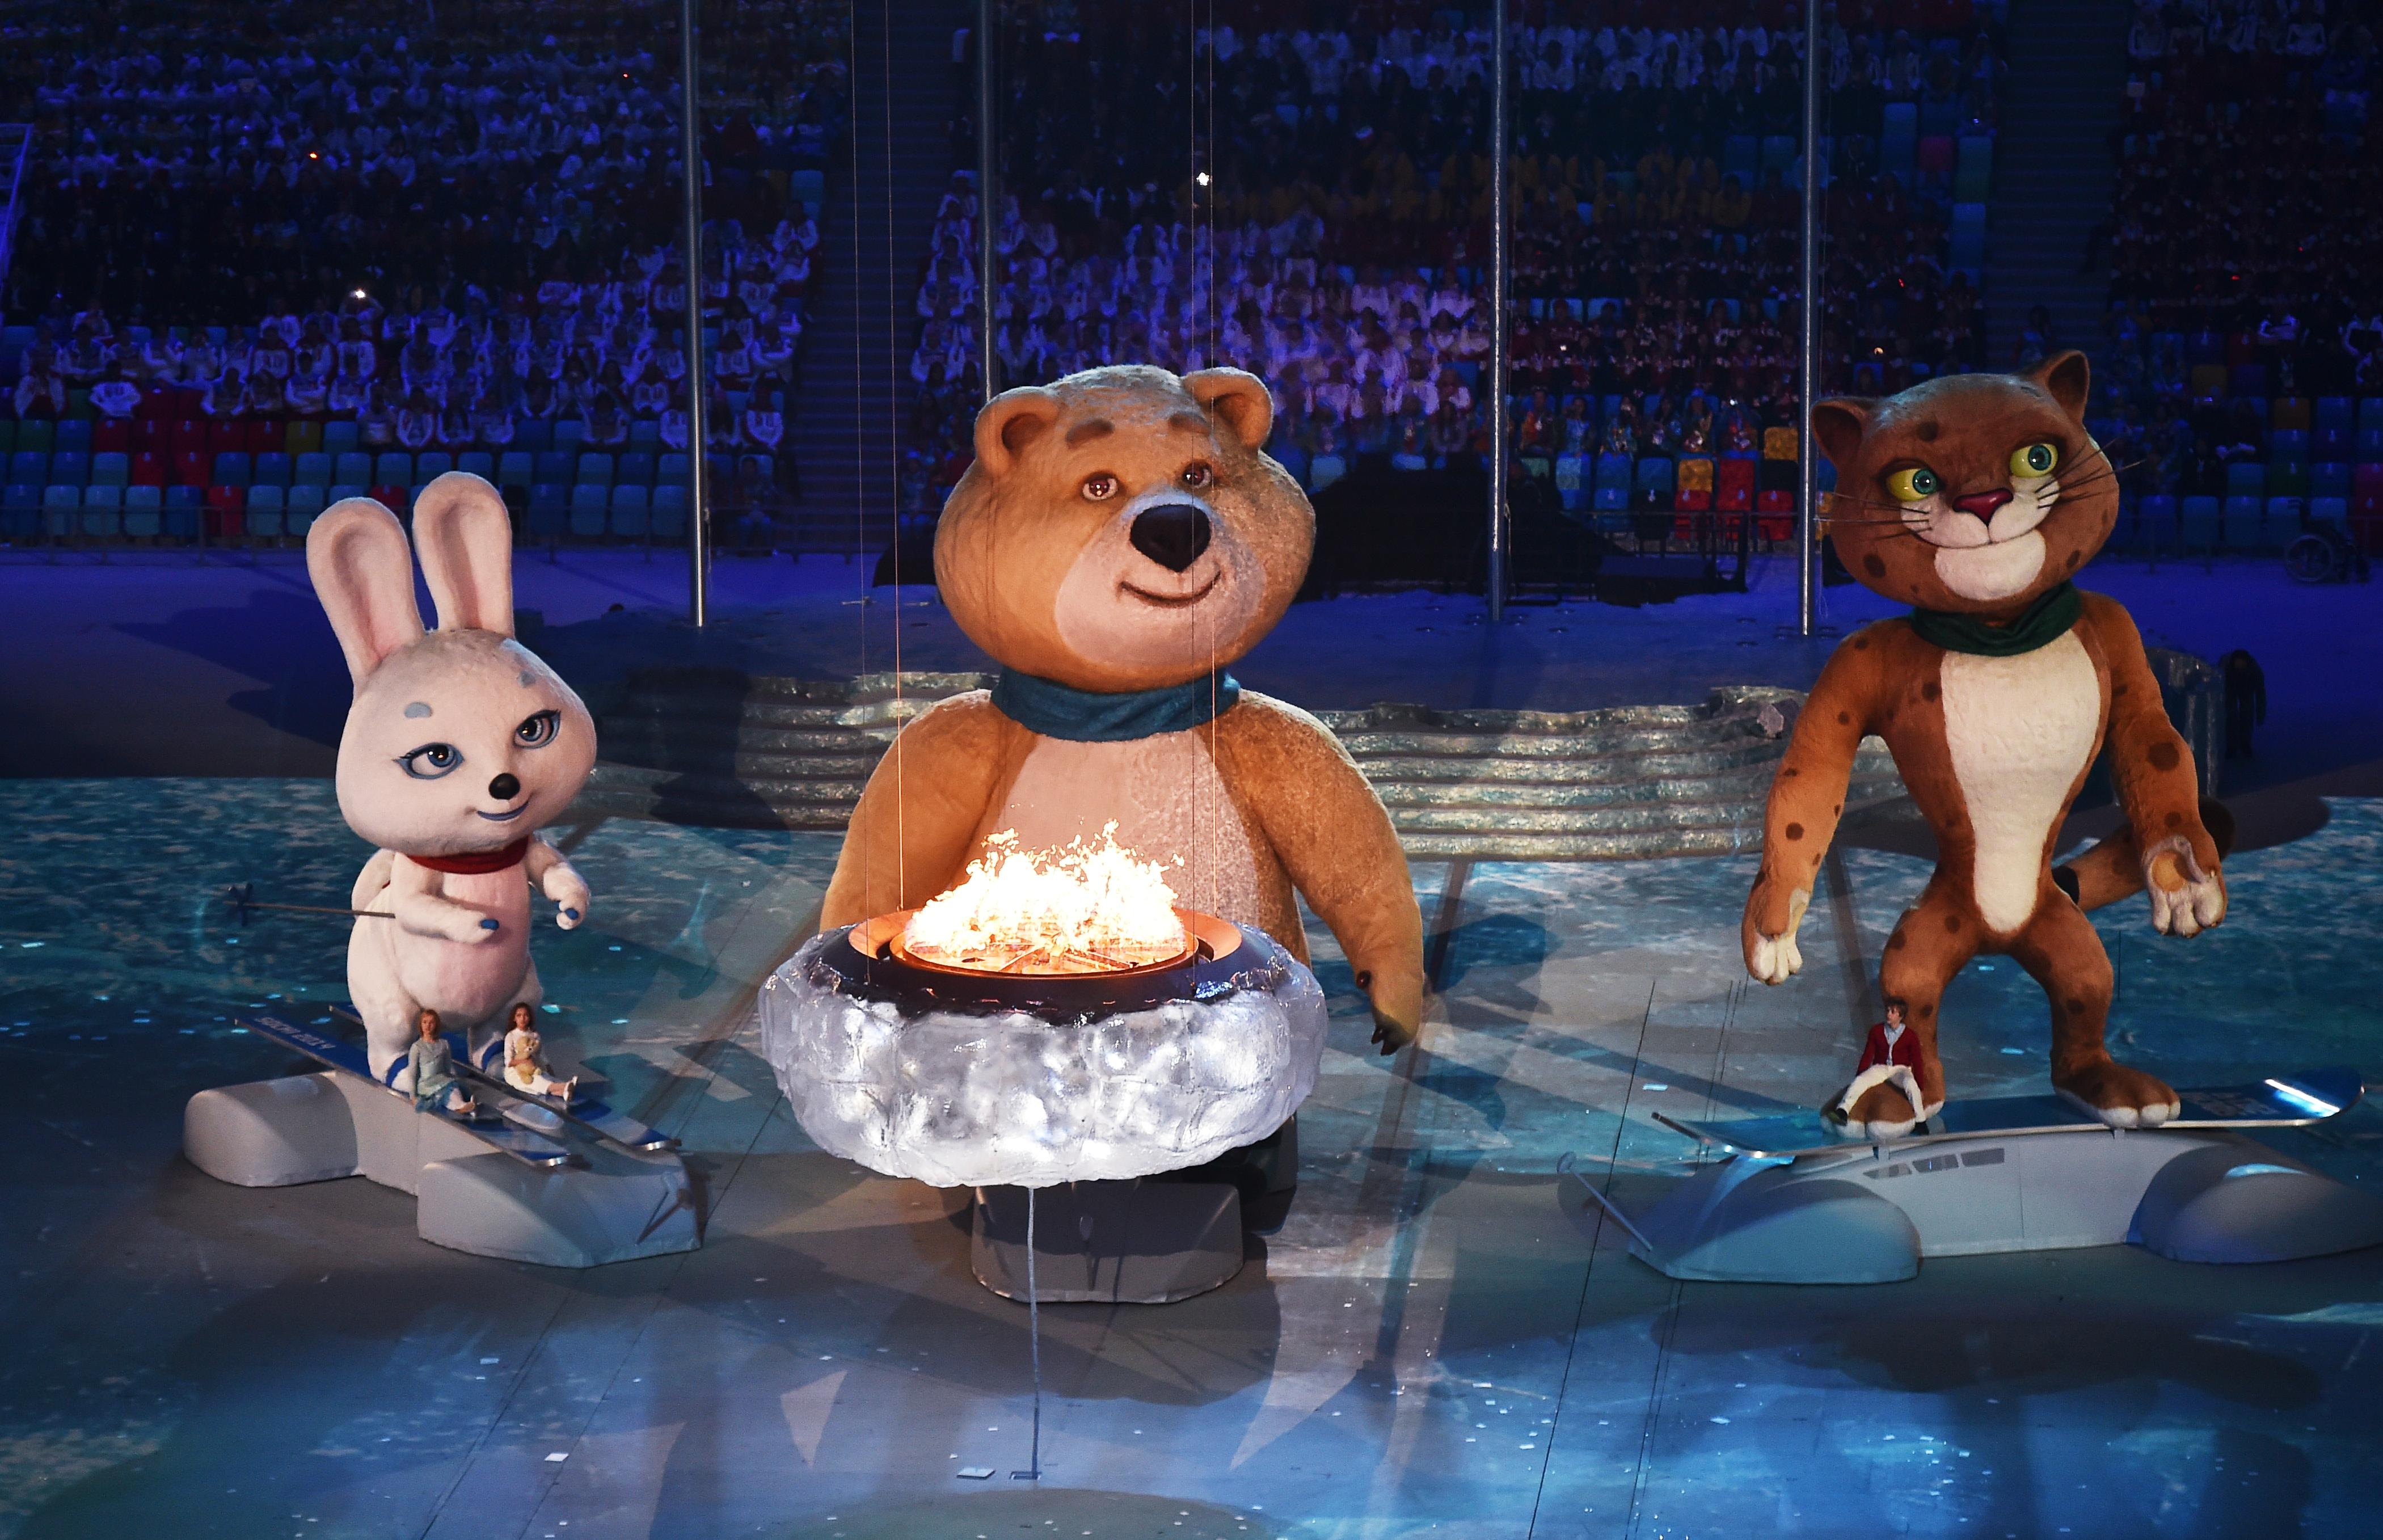 картинки олимпиады 2014 года в сочи